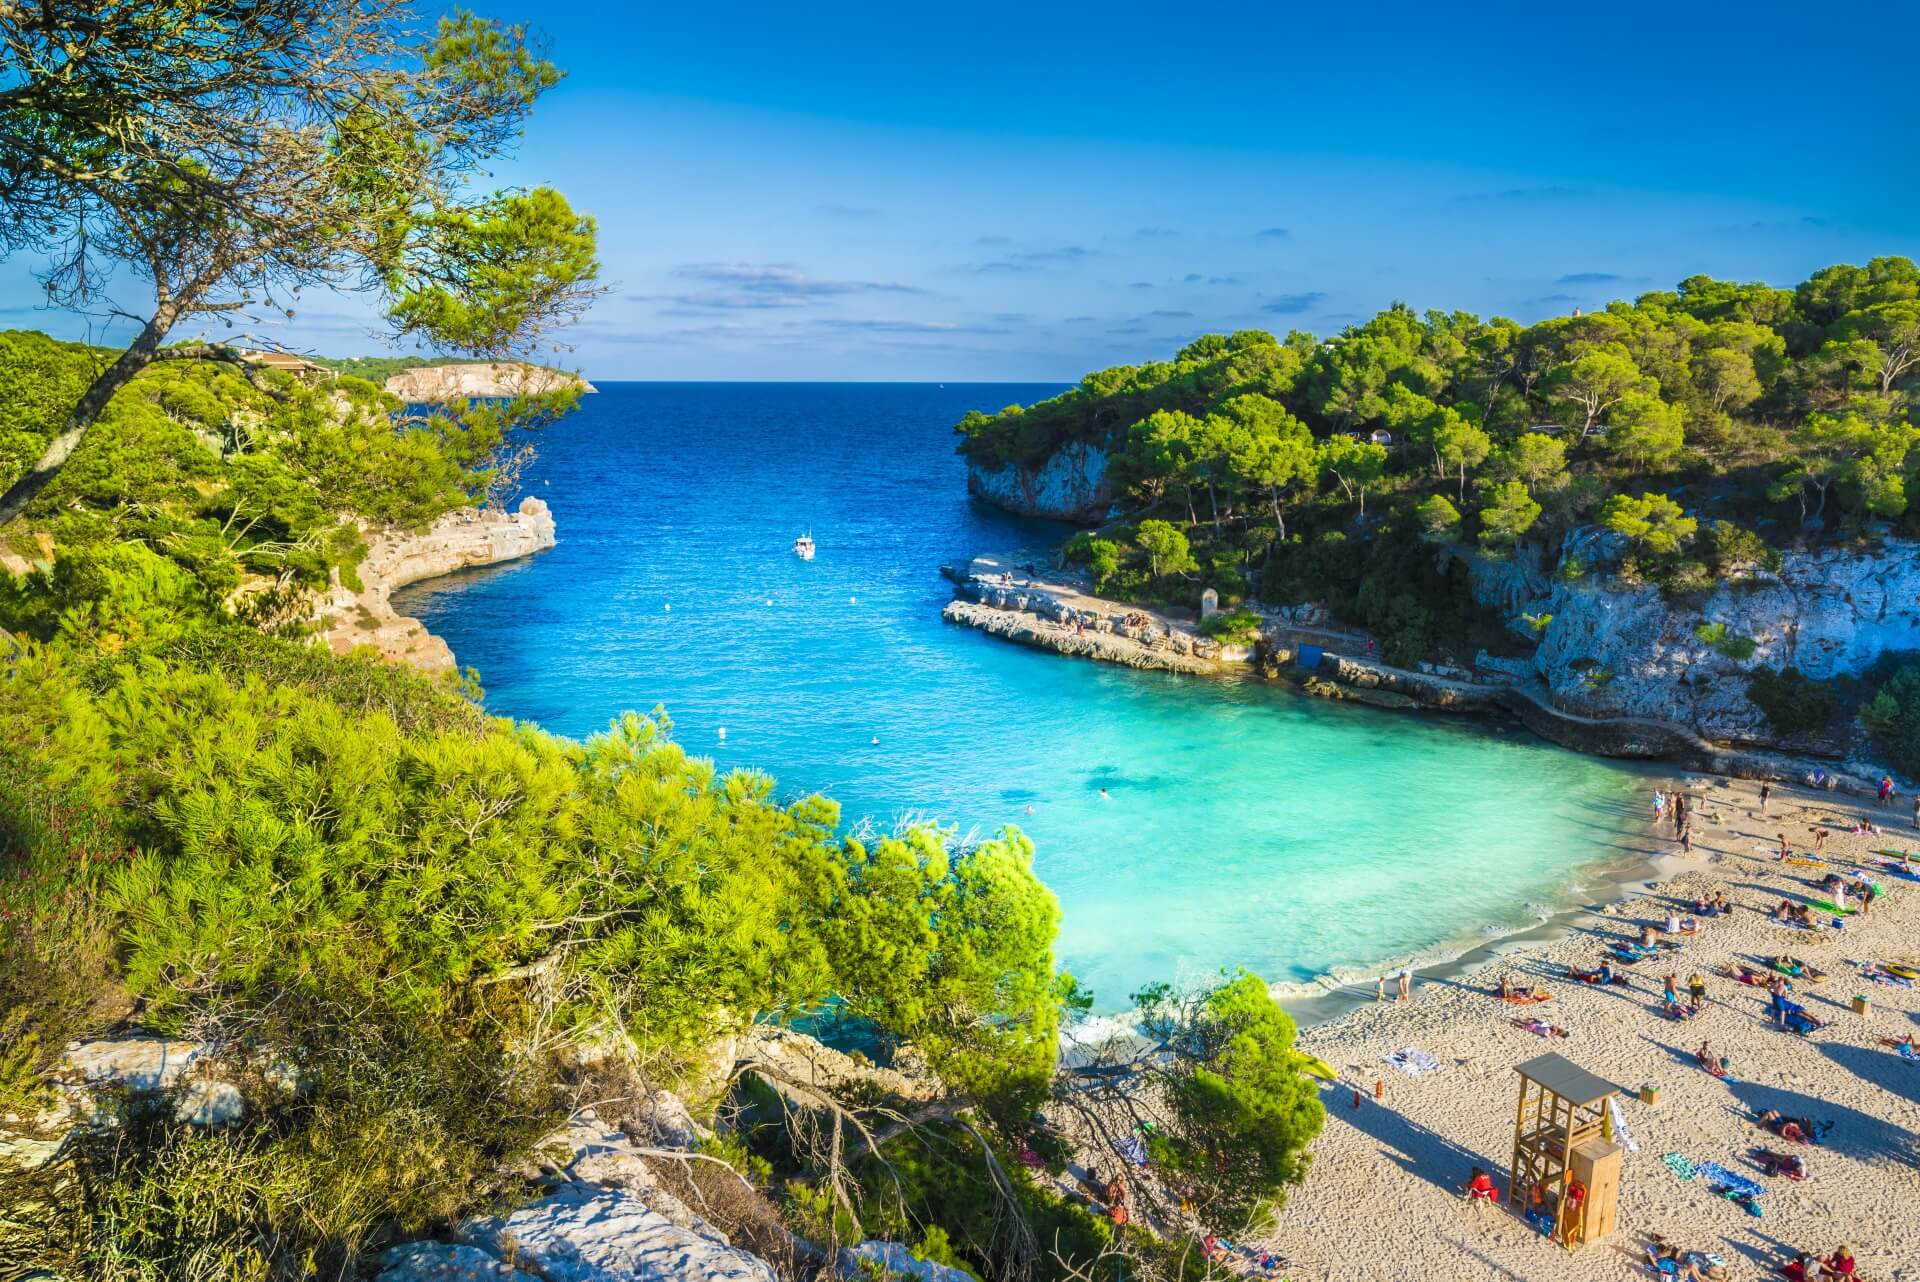 7 Tage Mallorca mit ÜF Veronica & Midas